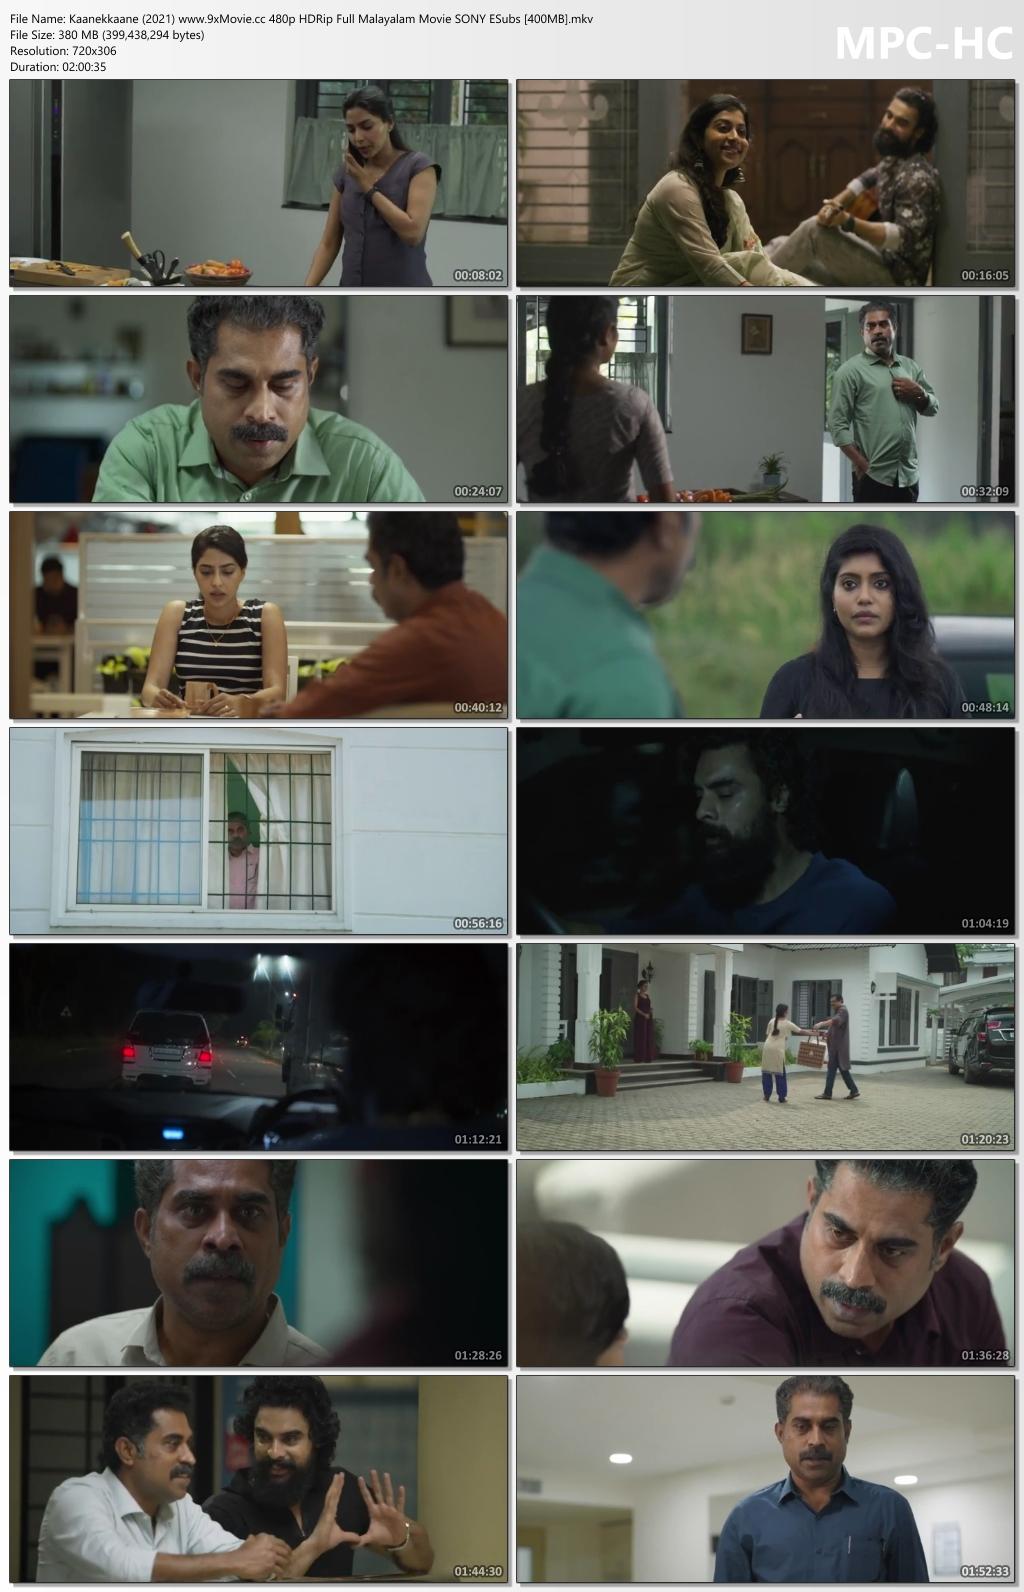 Kaanekkaane-2021-www-9x-Movie-cc-480p-HDRip-Full-Malayalam-Movie-SONY-ESubs-400-MB-mkv